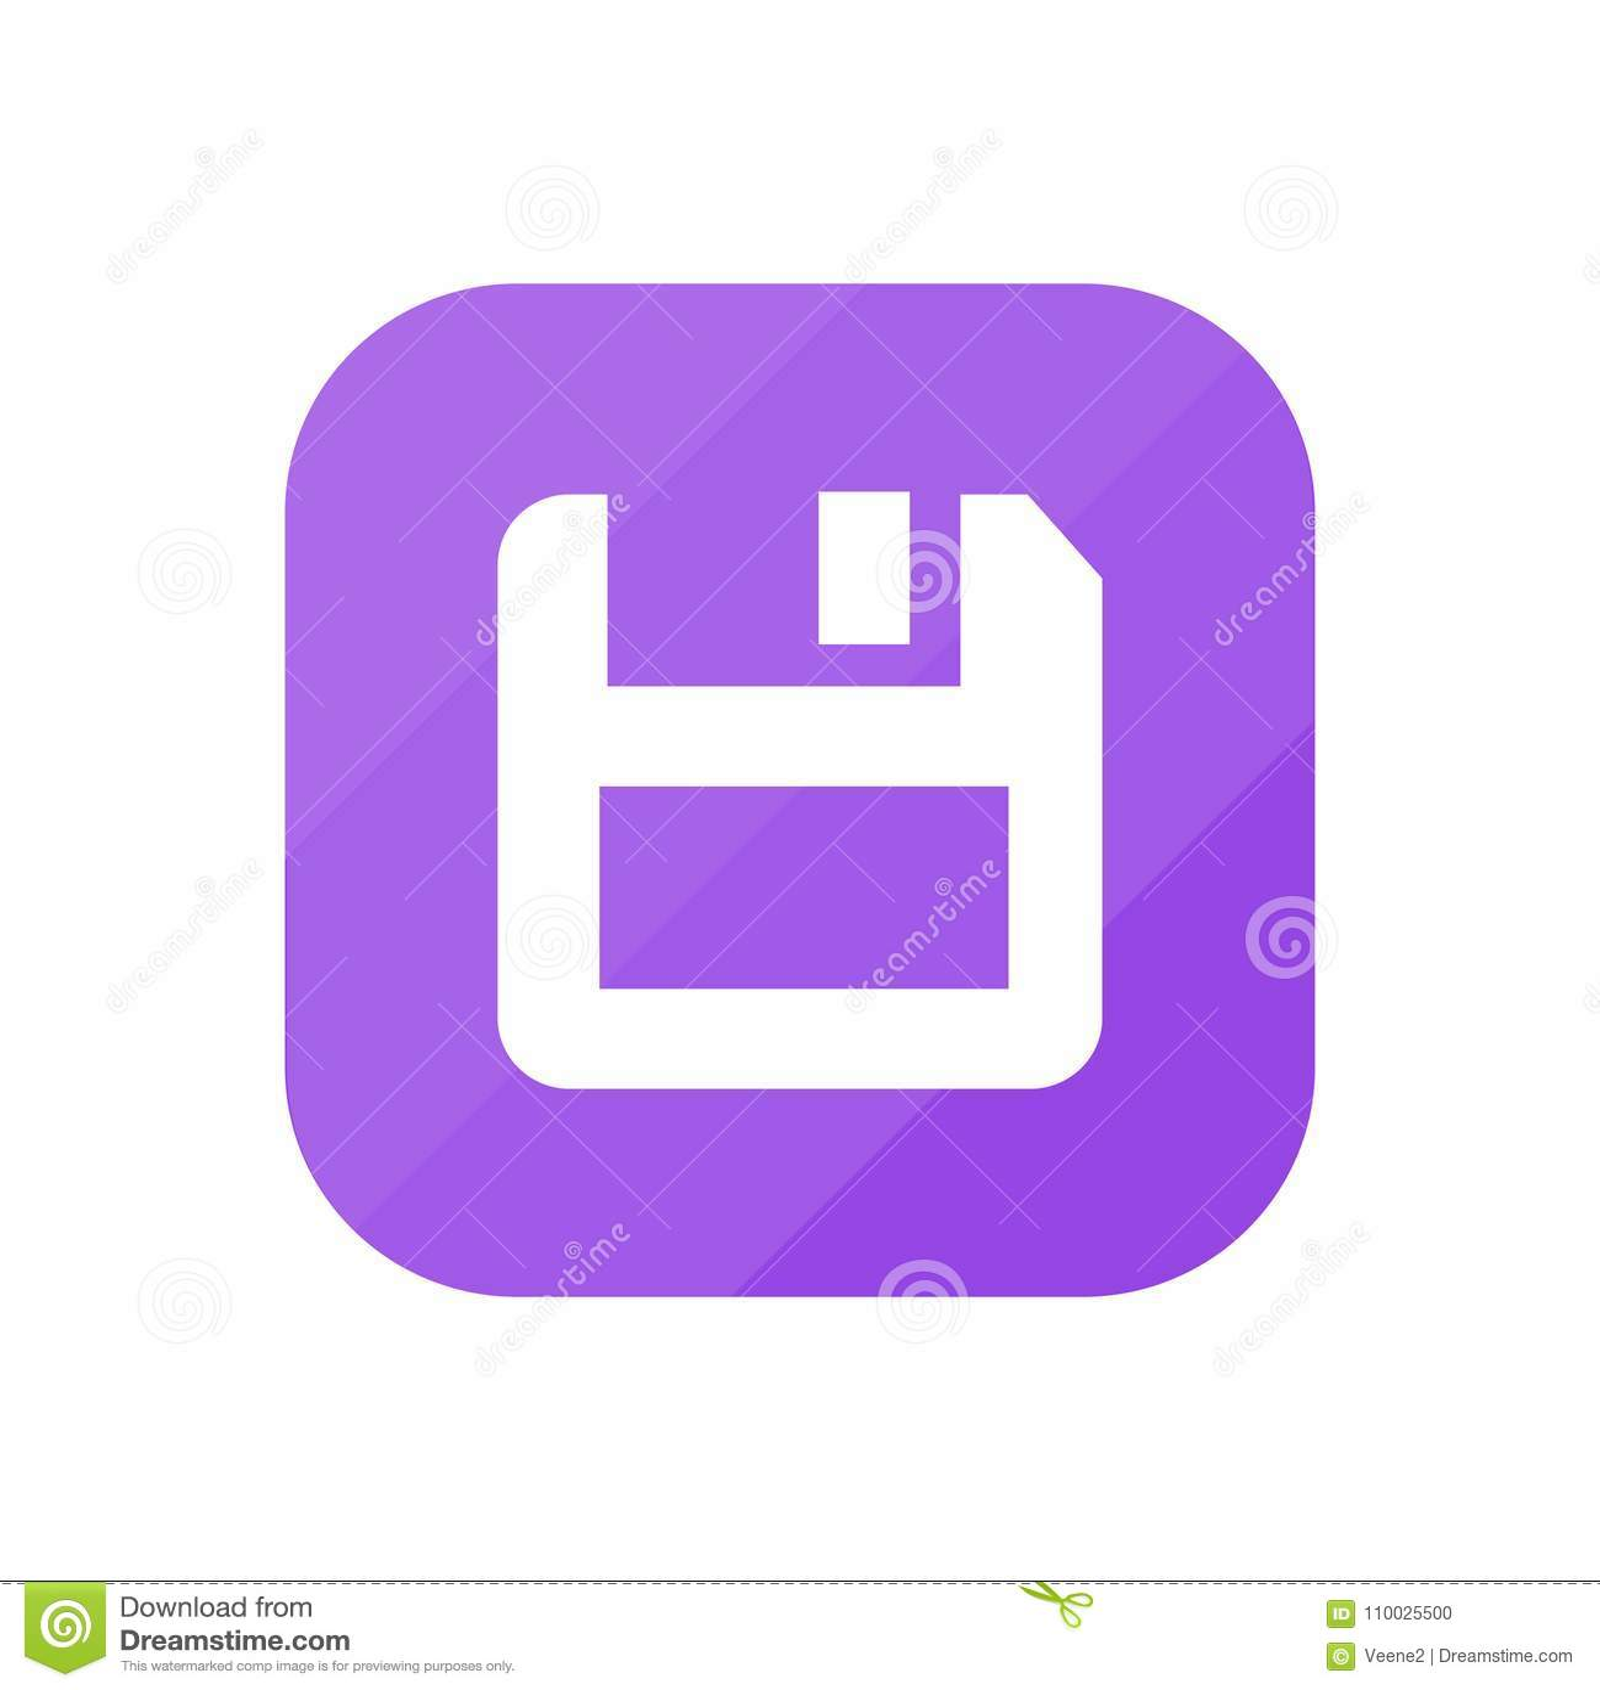 Slap - App Pictogram